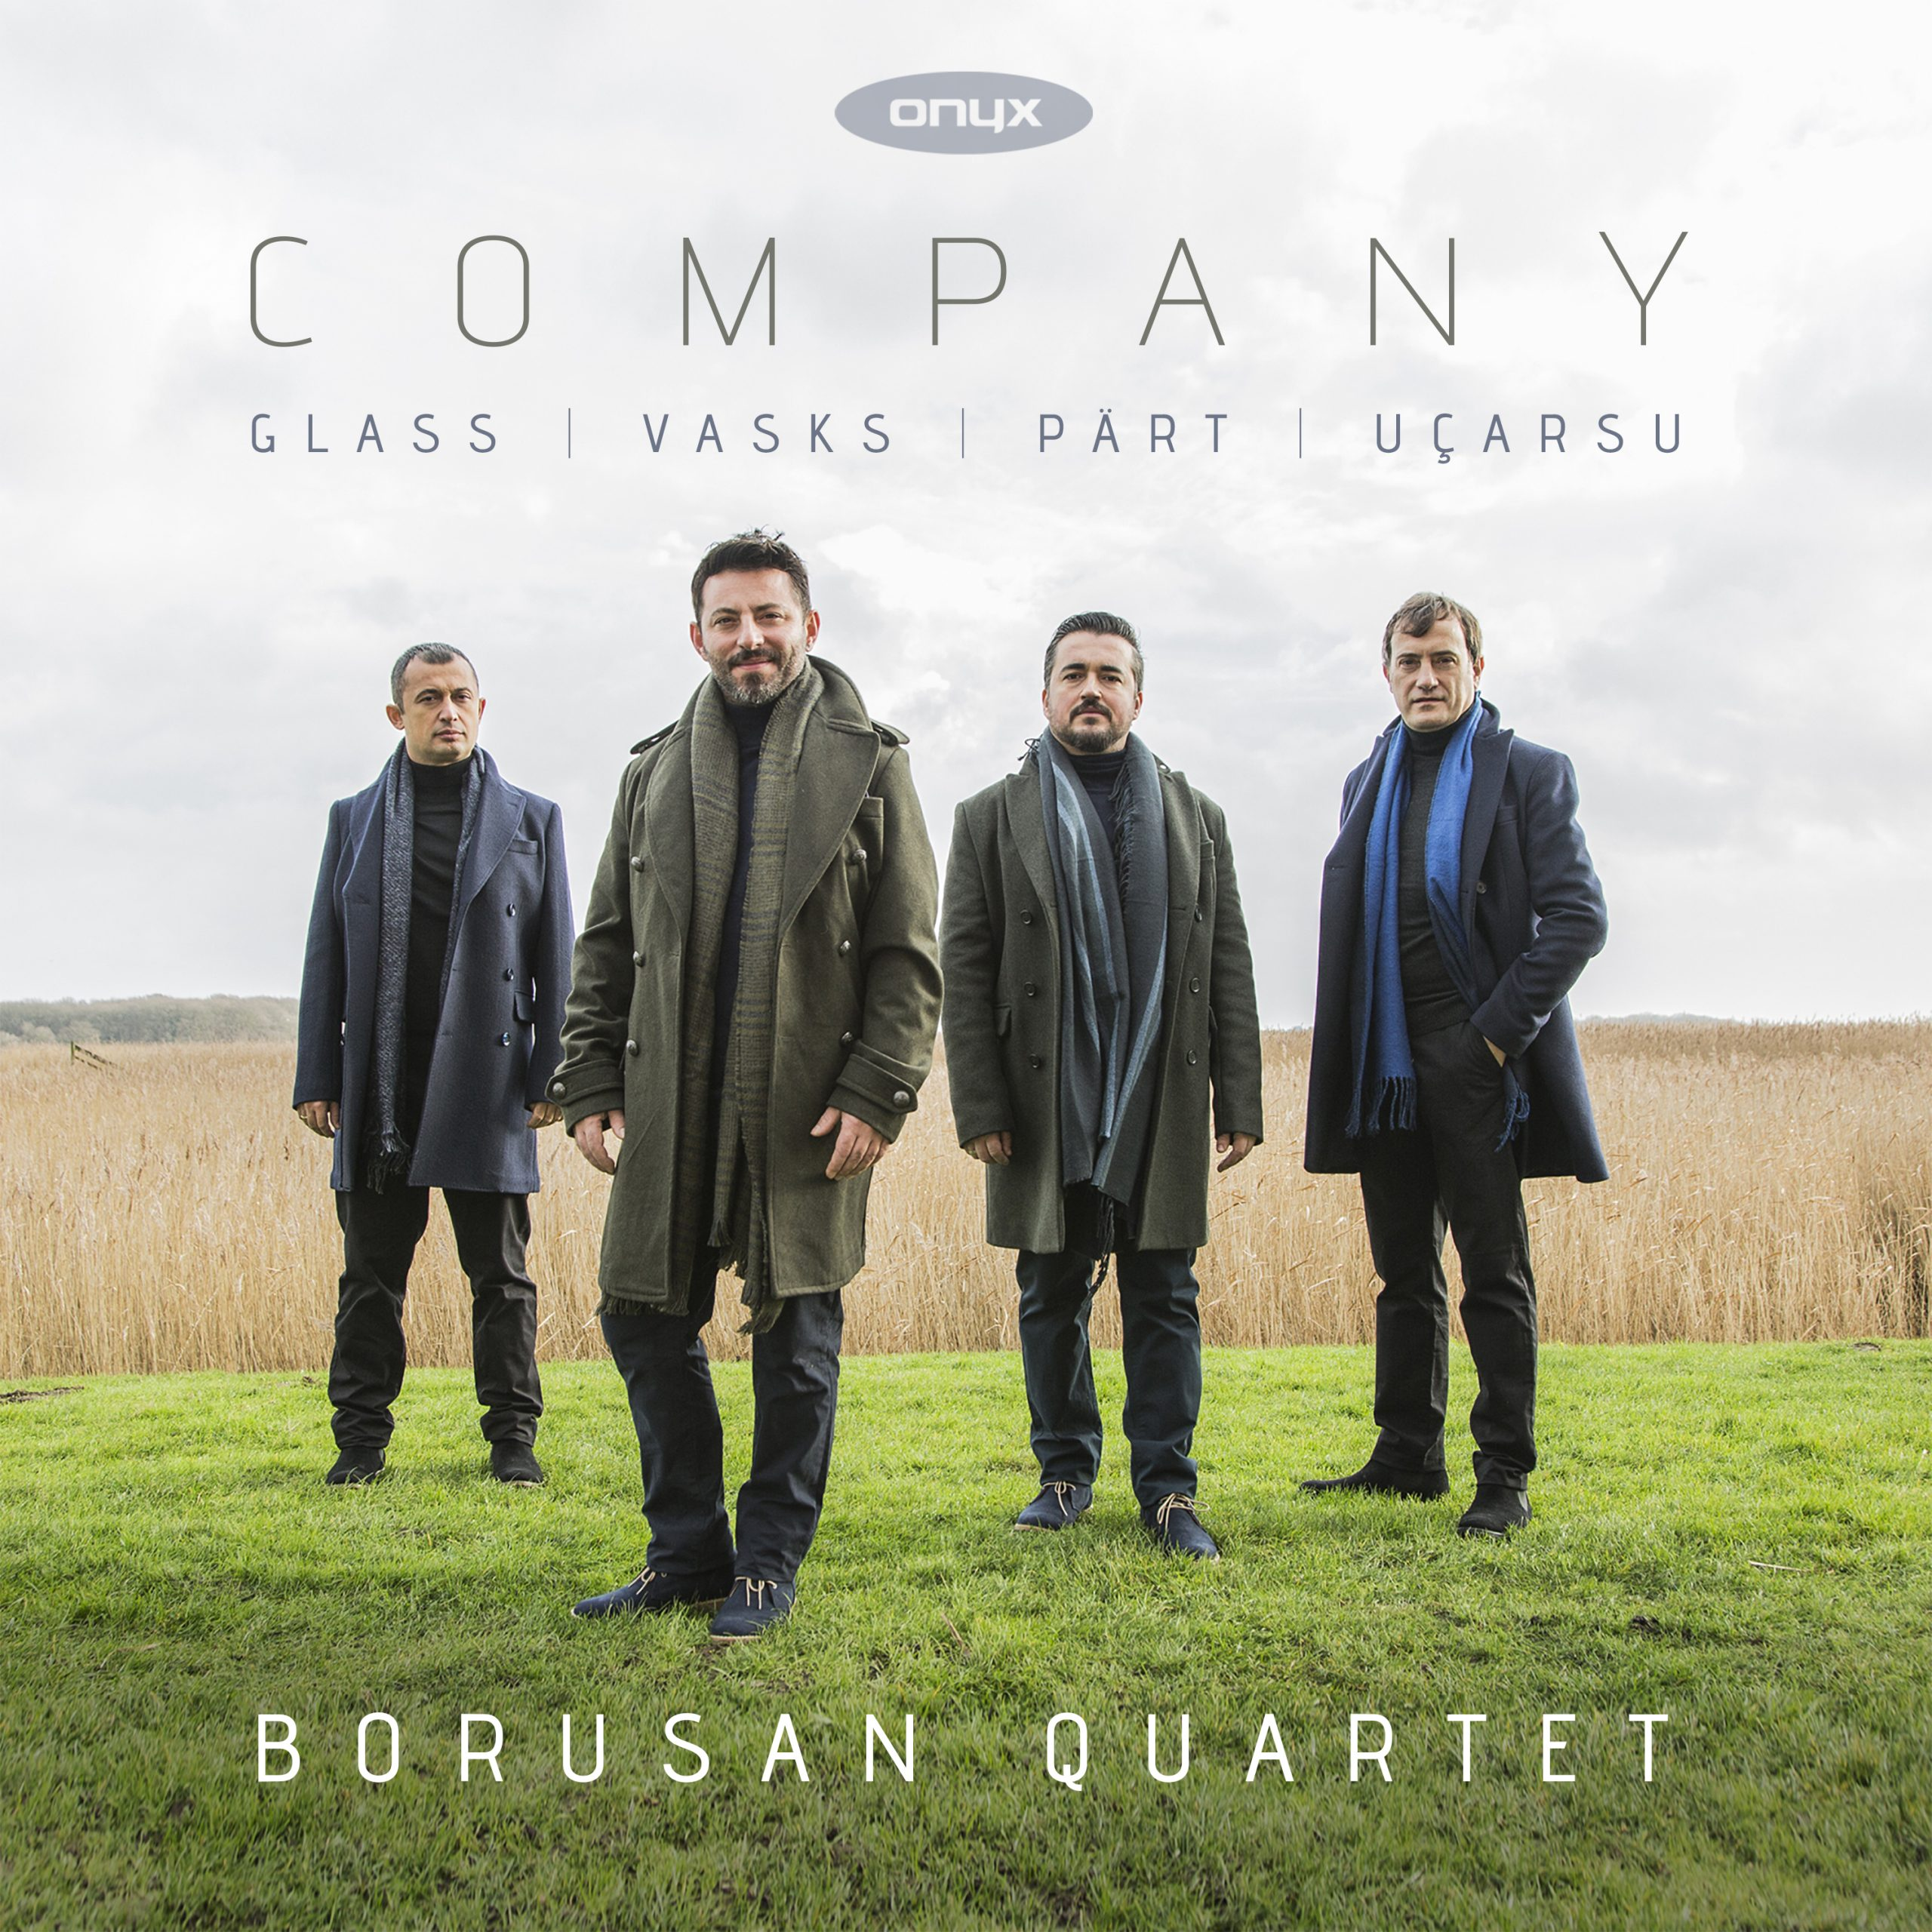 608Borusan Quartet